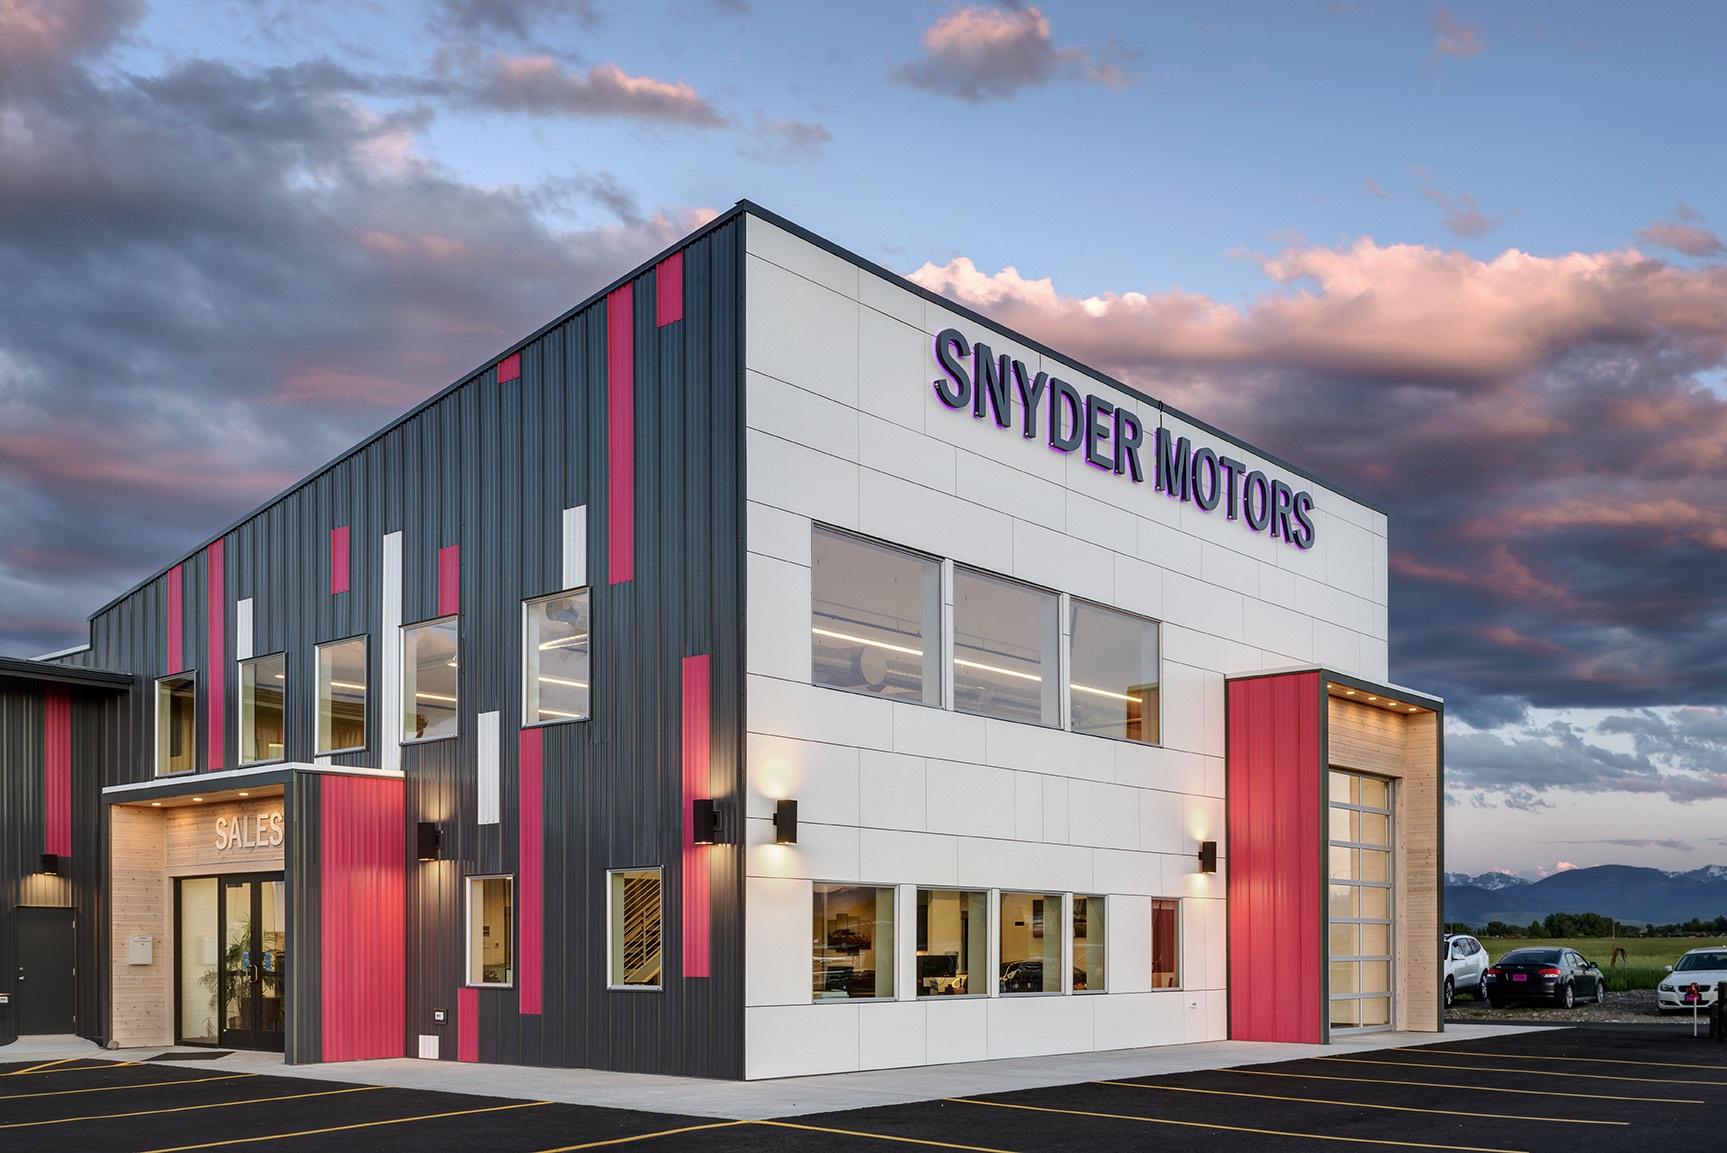 Snyder_Motors_LowRez+%2814%29.jpg